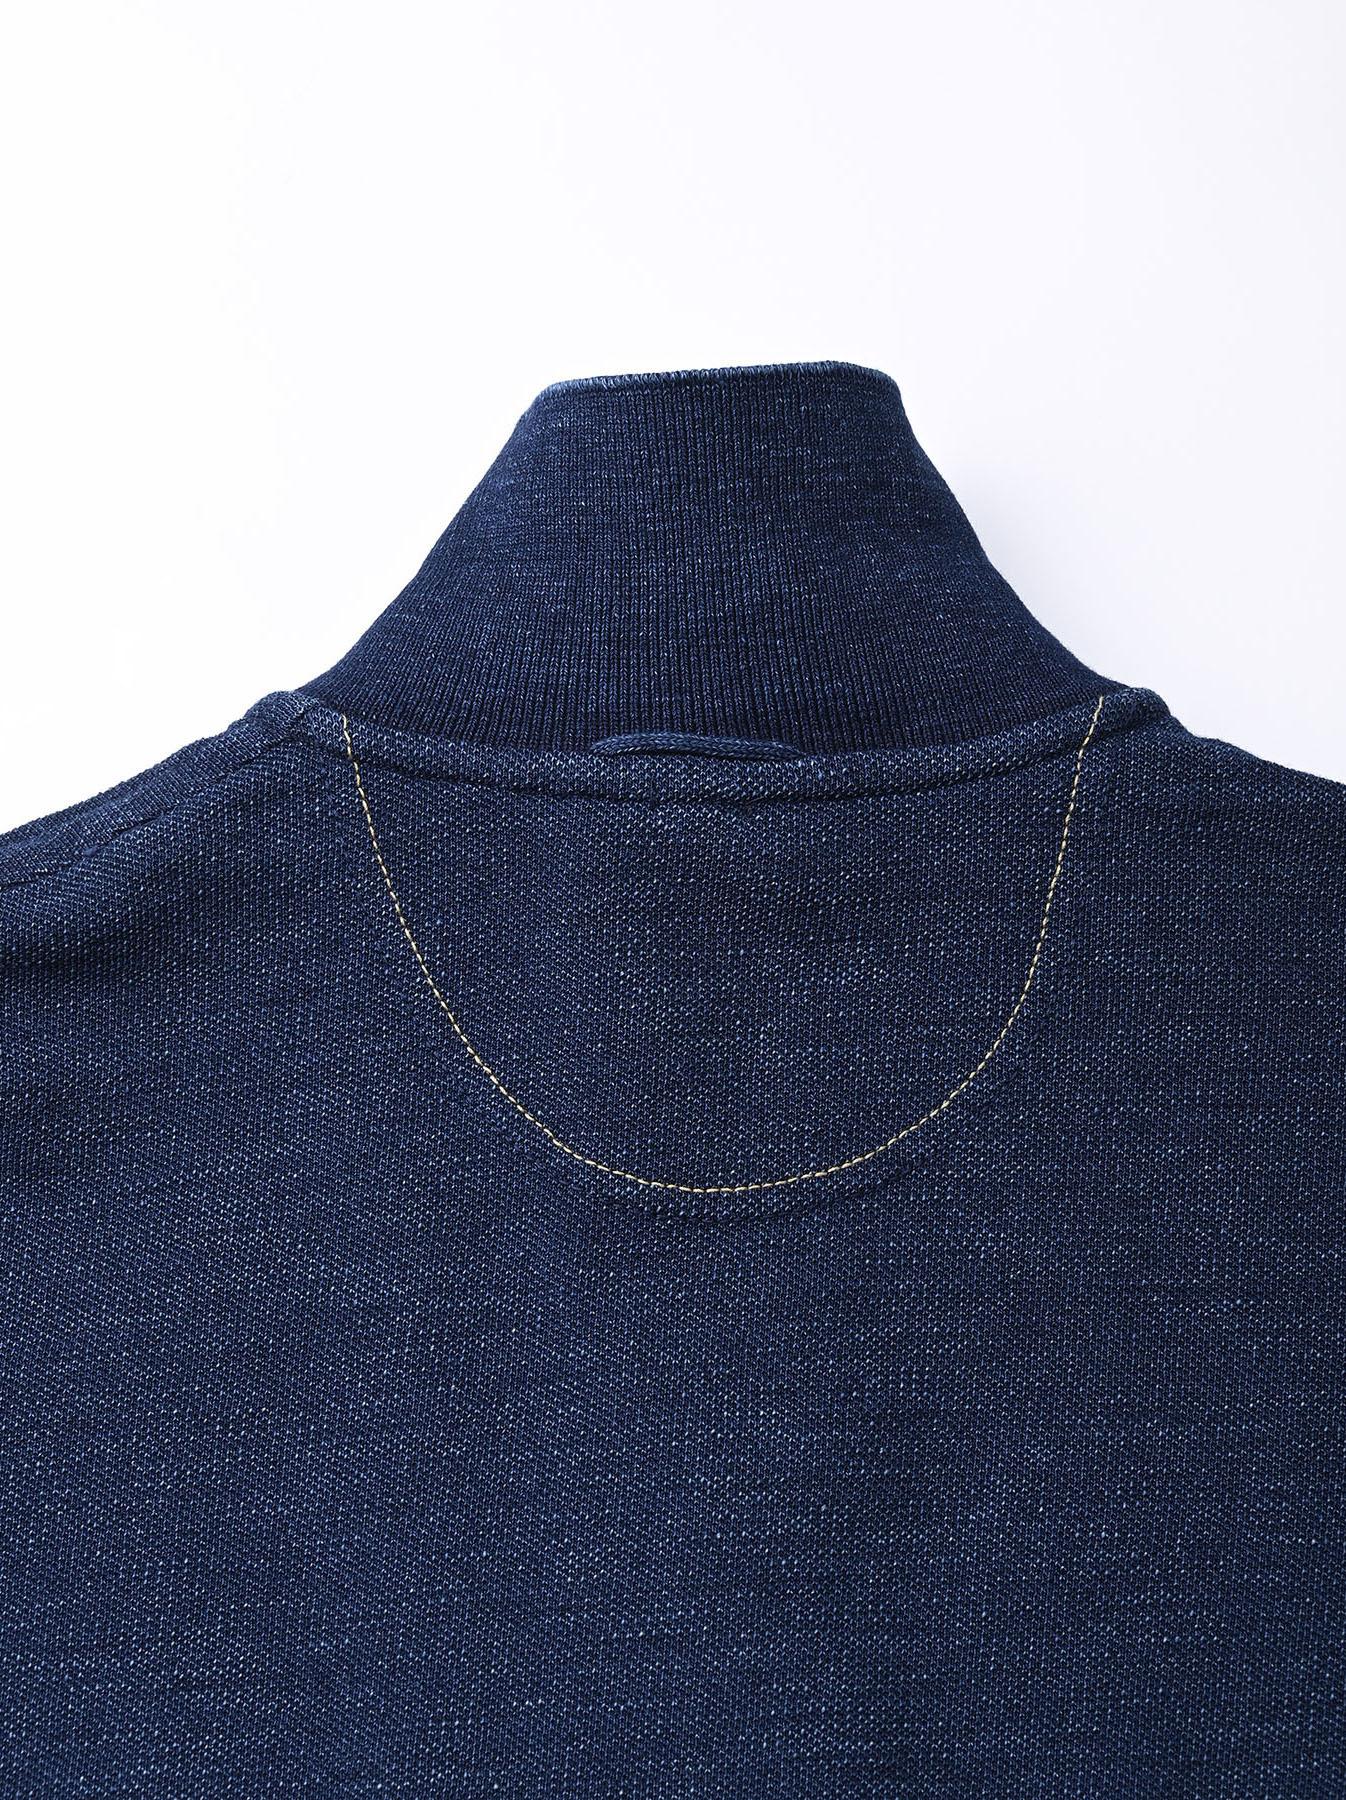 Indigo Kanoko Shiokaze Long-sleeved Square Polo Shirt (0521)-9